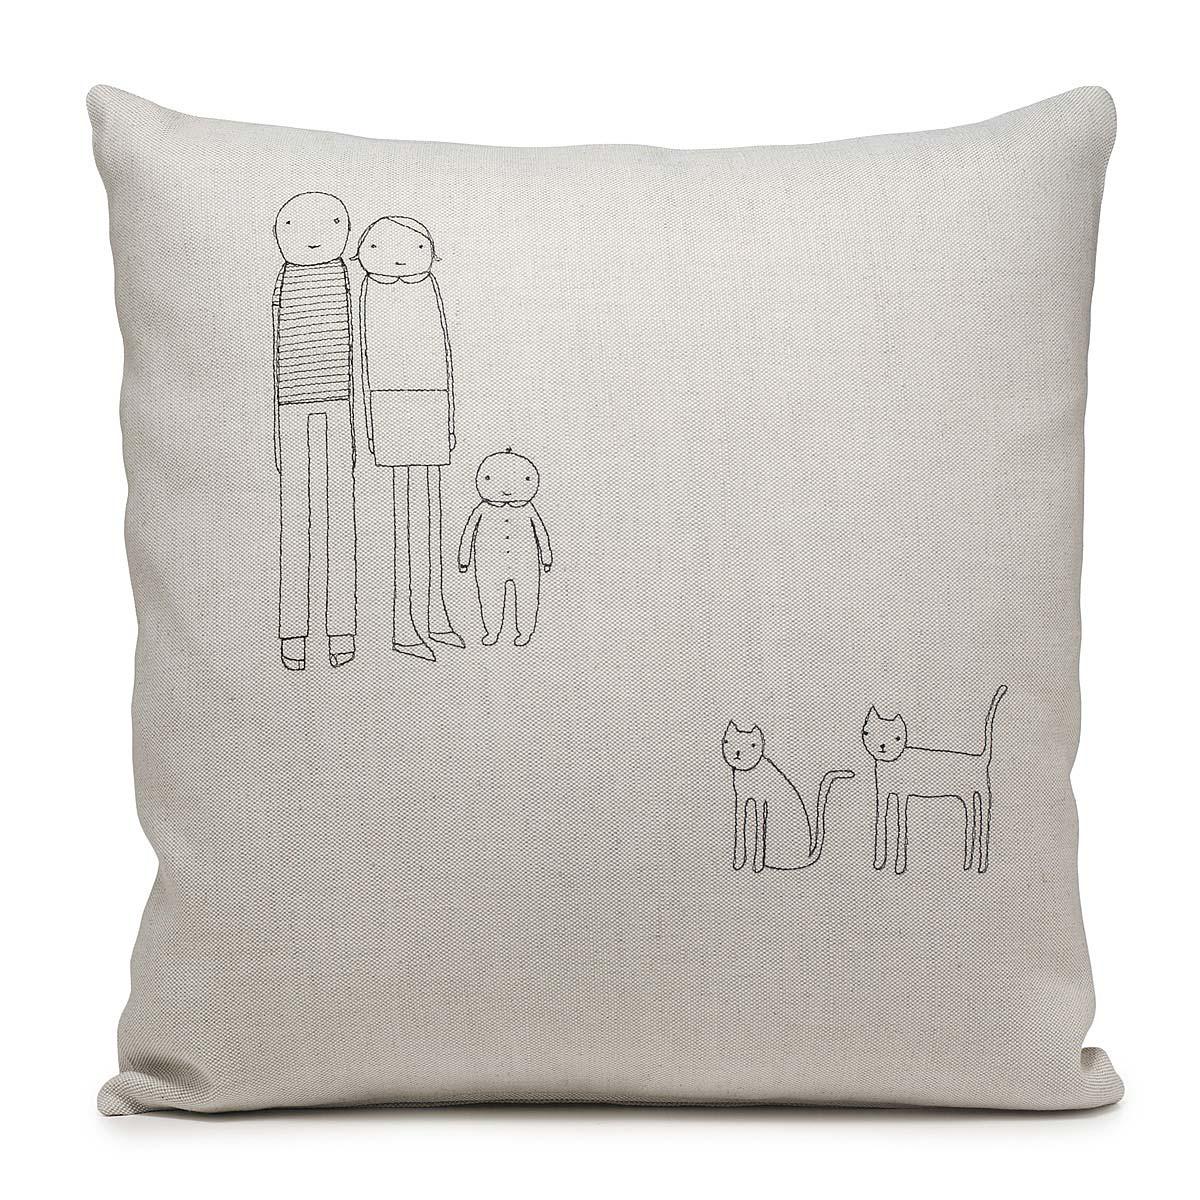 Custom Pillows Minneapolis